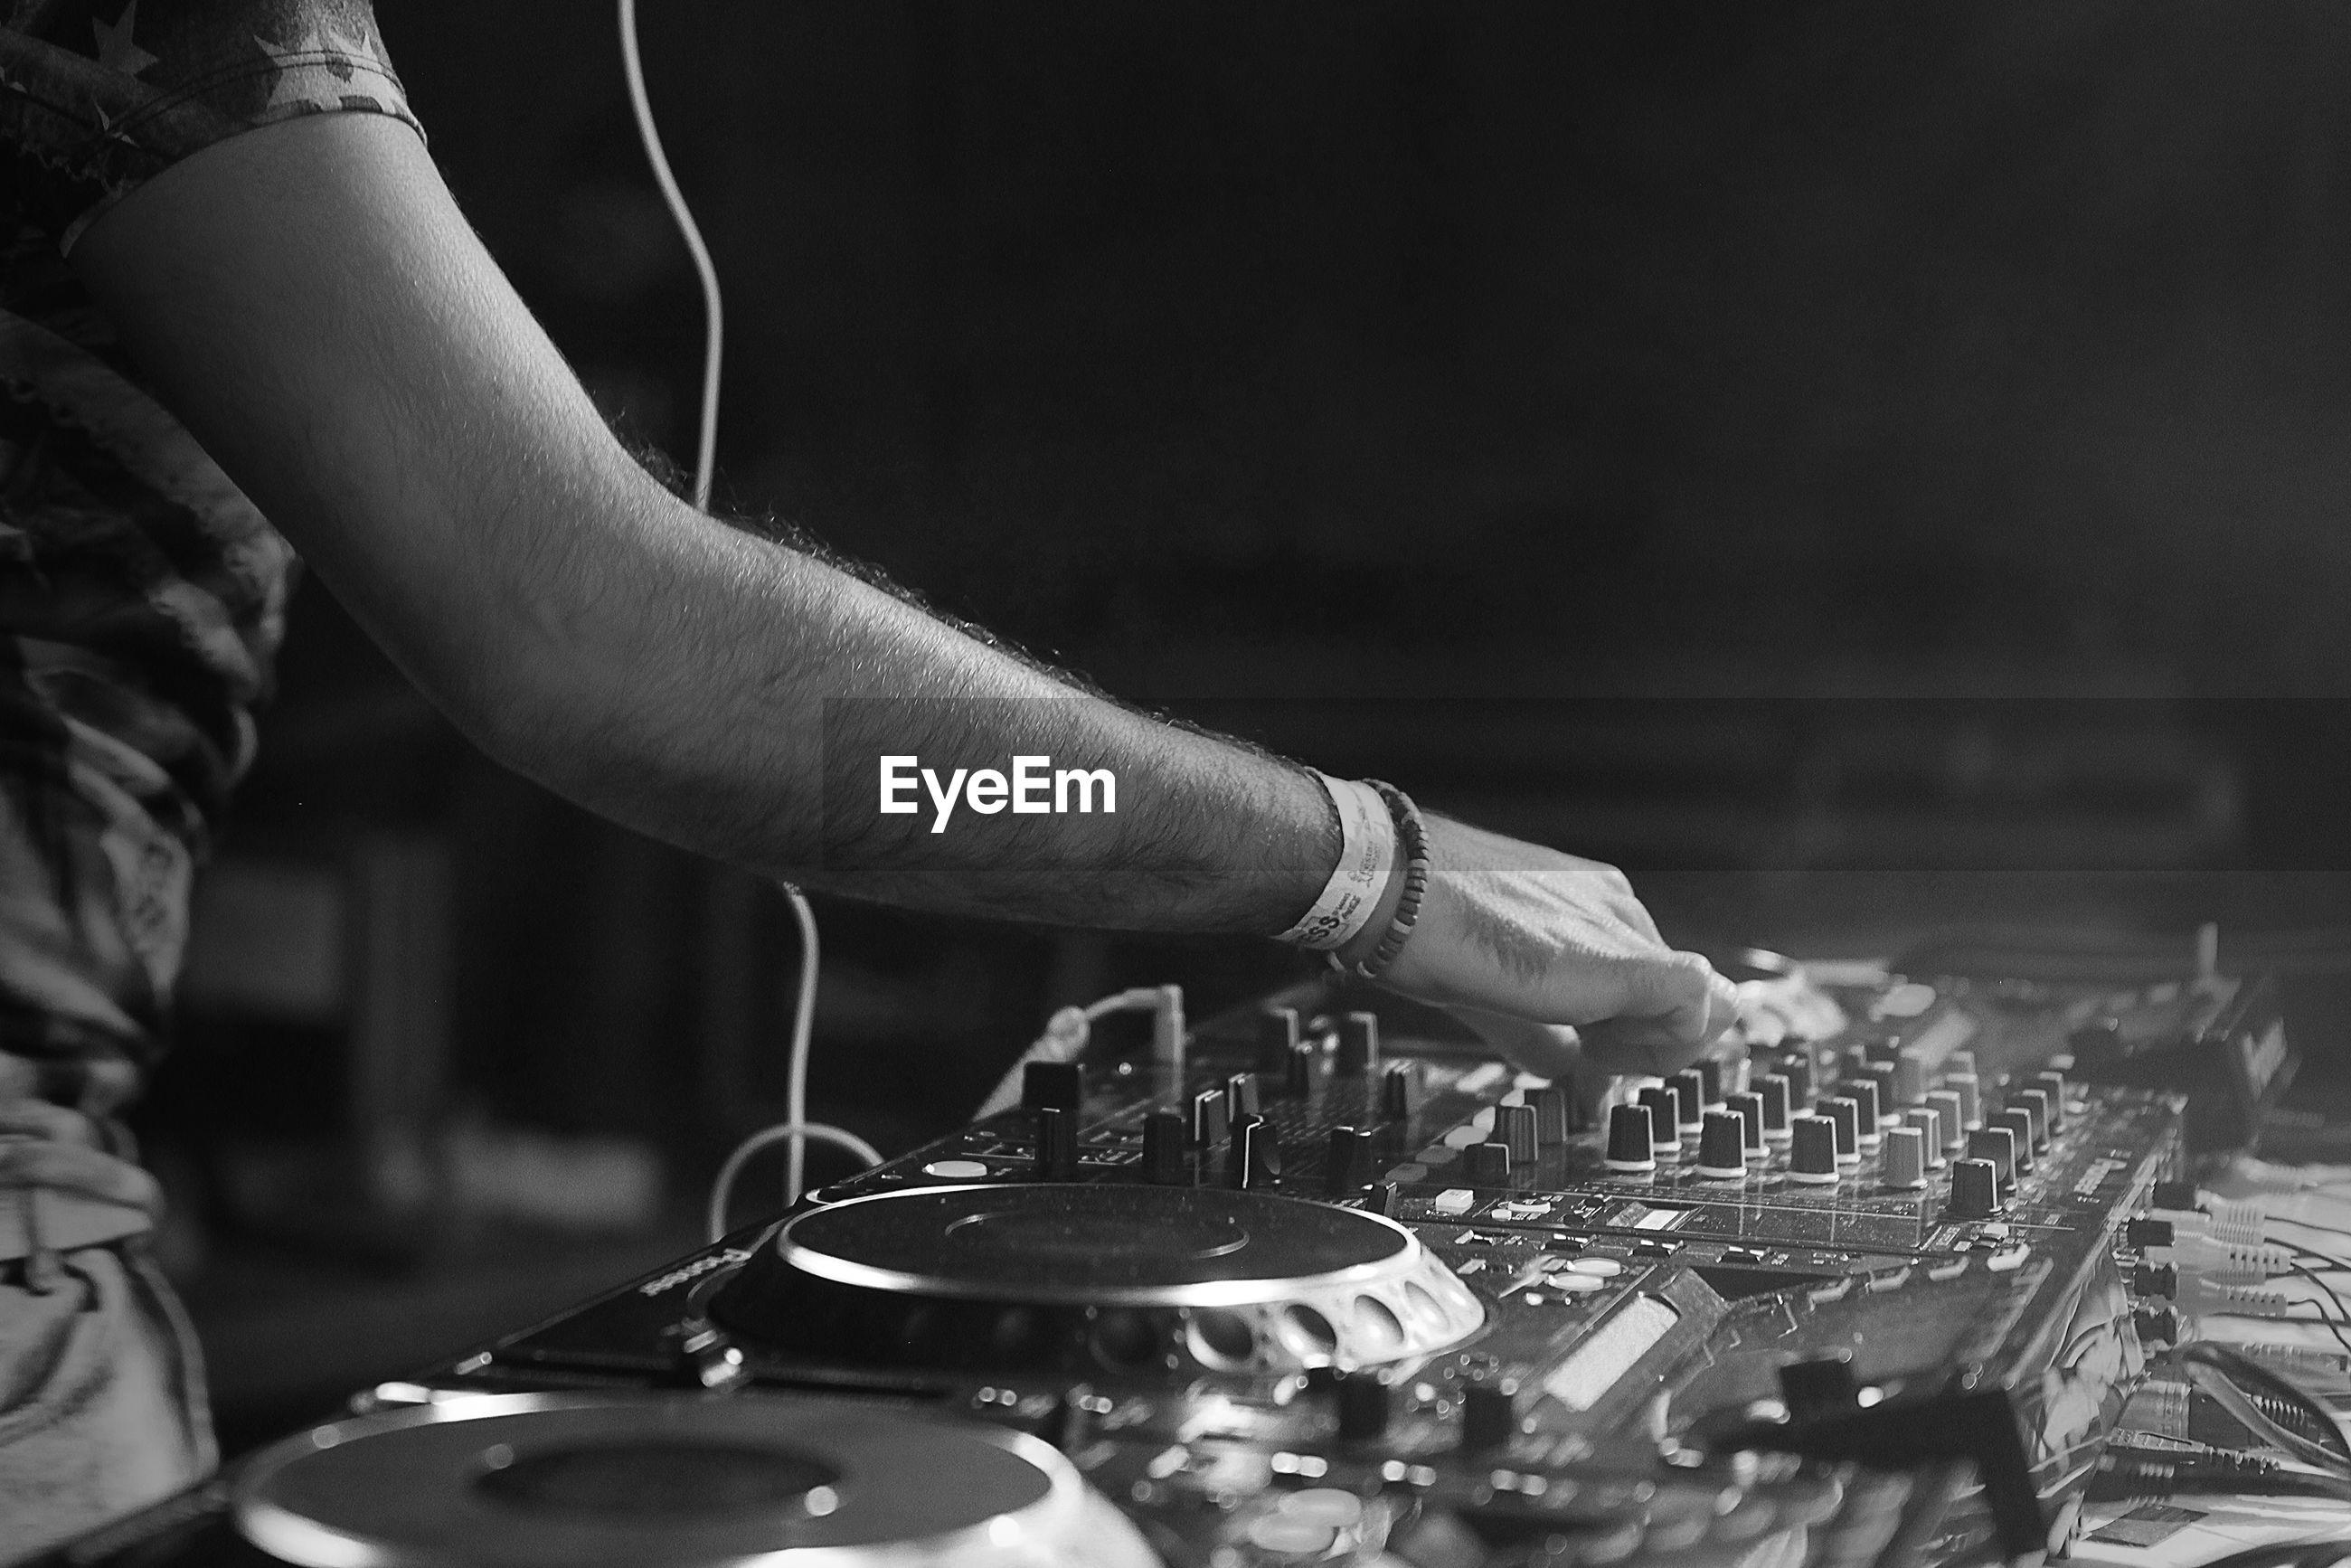 Midsection of dj adjusting sound mixer in nightclub